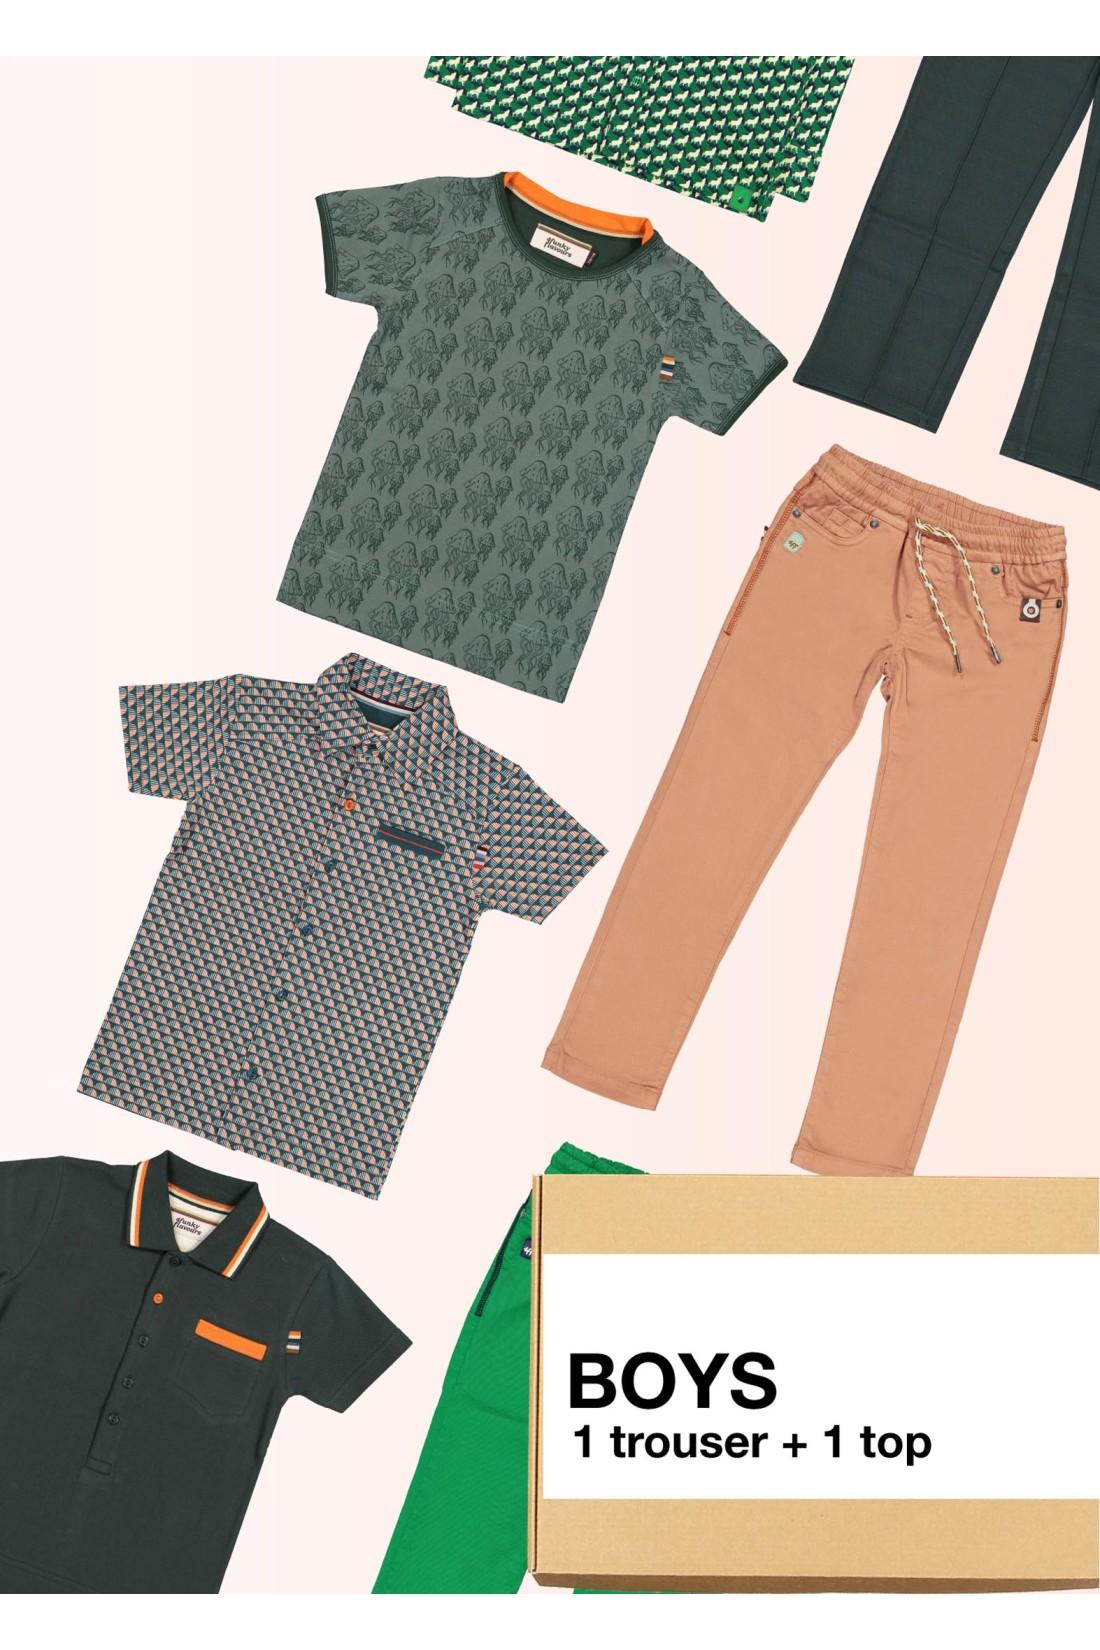 Surprise Box Boy - 2 Styles - Trousers Long + Top